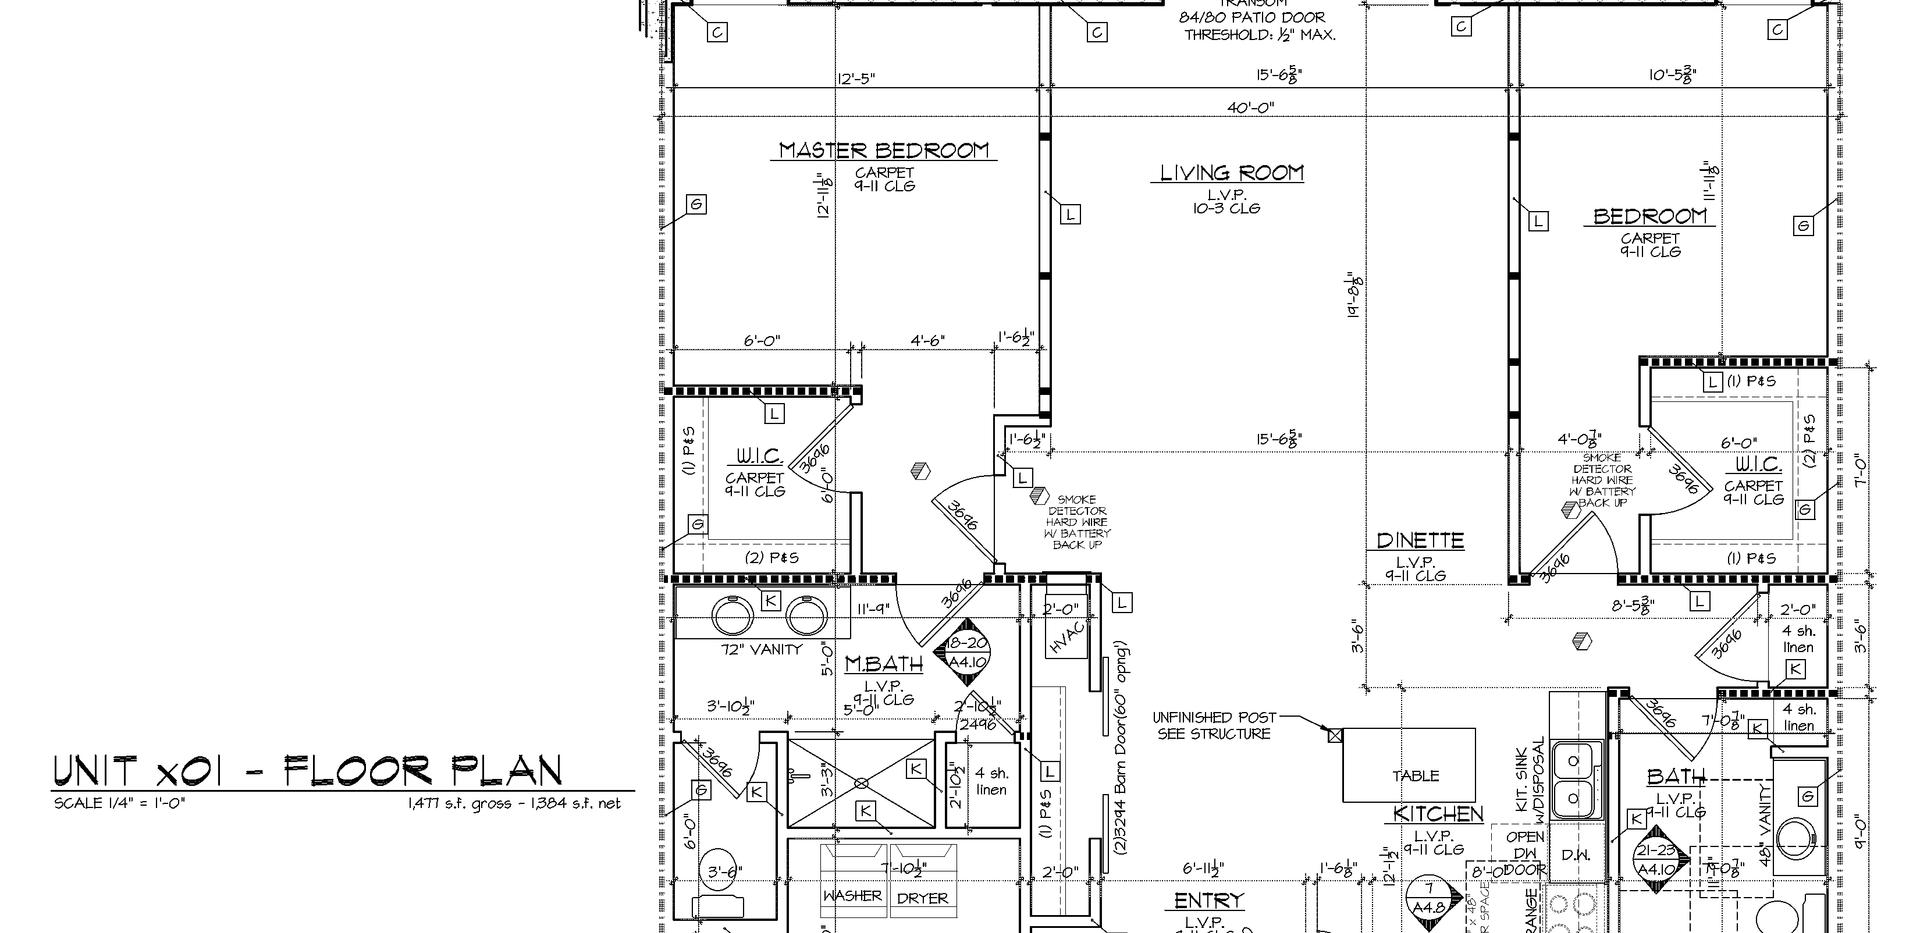 Manseau Falts - Unit Plan - X01.png